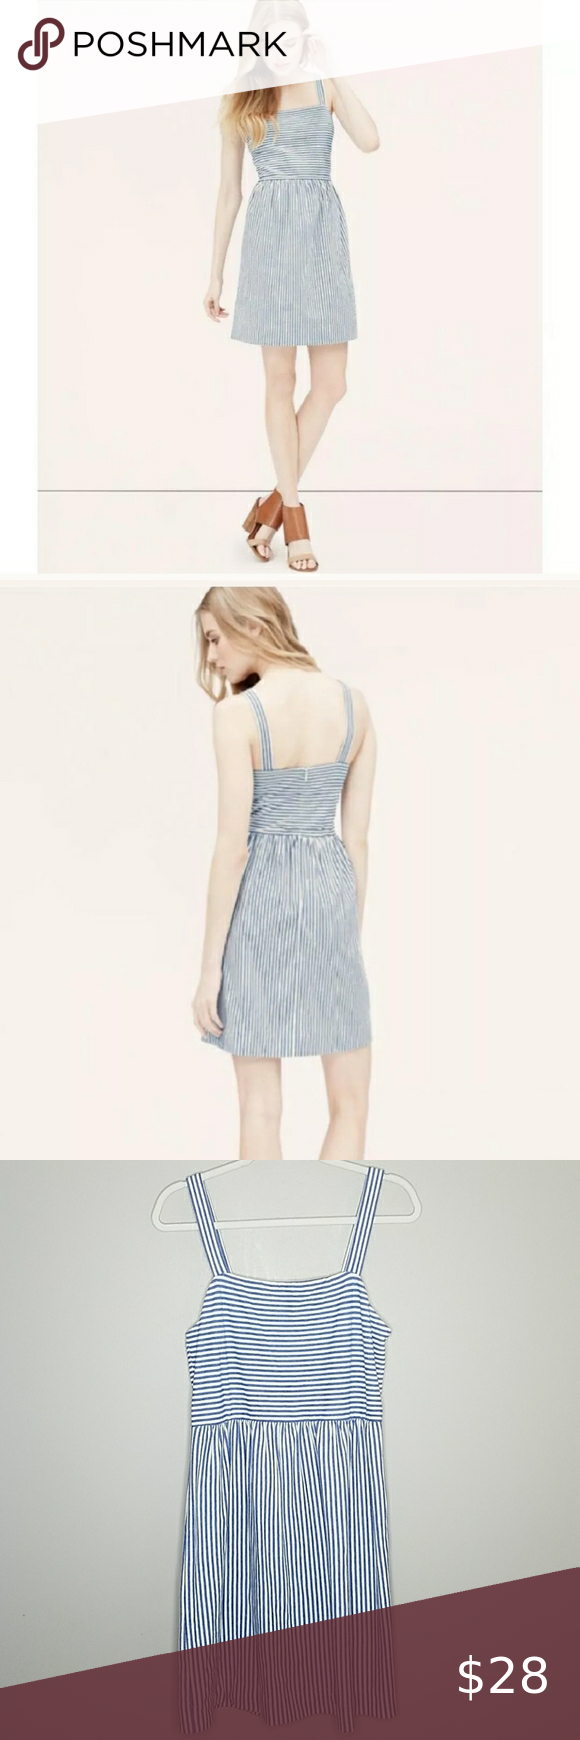 Loft Striped Strappy Flare Dress, Medium Loft Striped Strappy Flare Dress, Medium in Blue and White Stripes, 100% Cotton, Zipper down the back.  Measures approximately 38